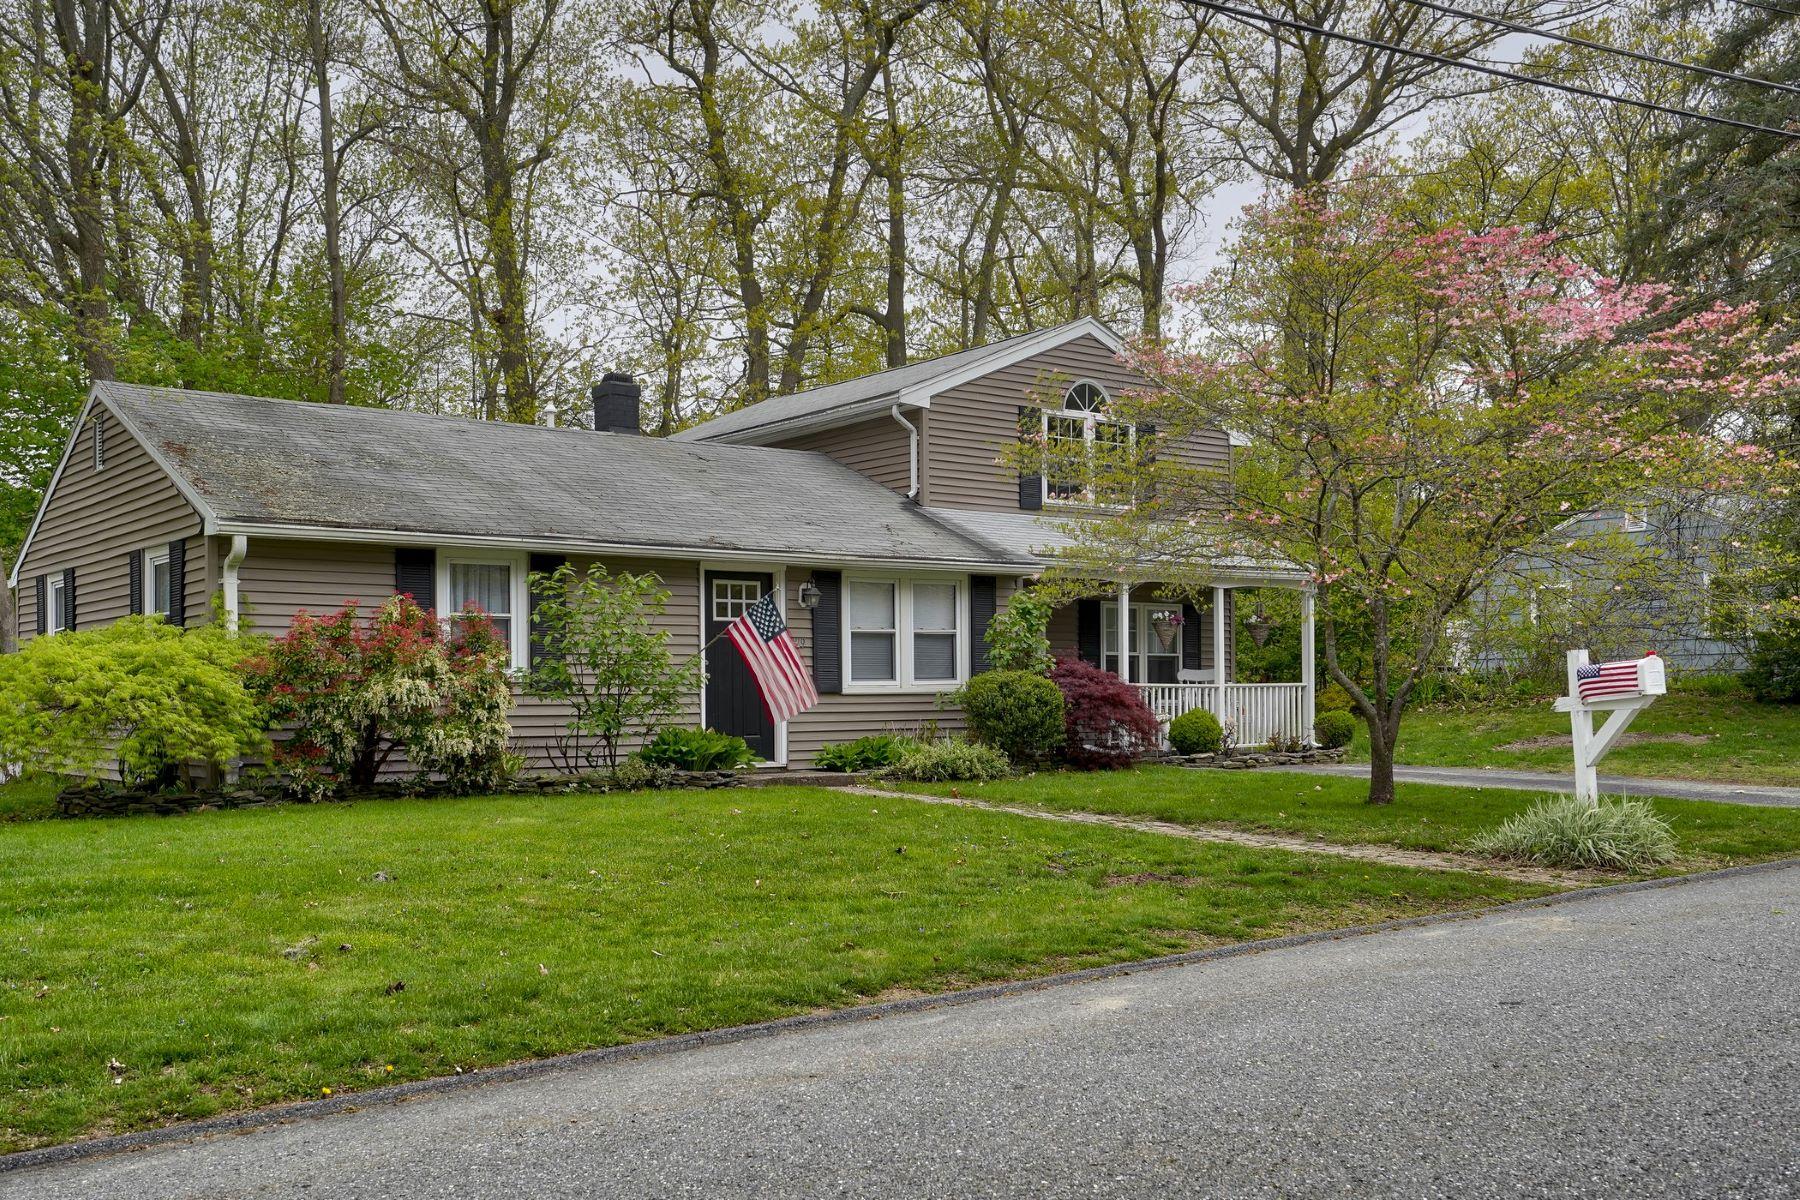 Single Family Home for Active at 29 Lindsay Road, Billerica 29 Lindsay Rd Billerica, Massachusetts 01821 United States